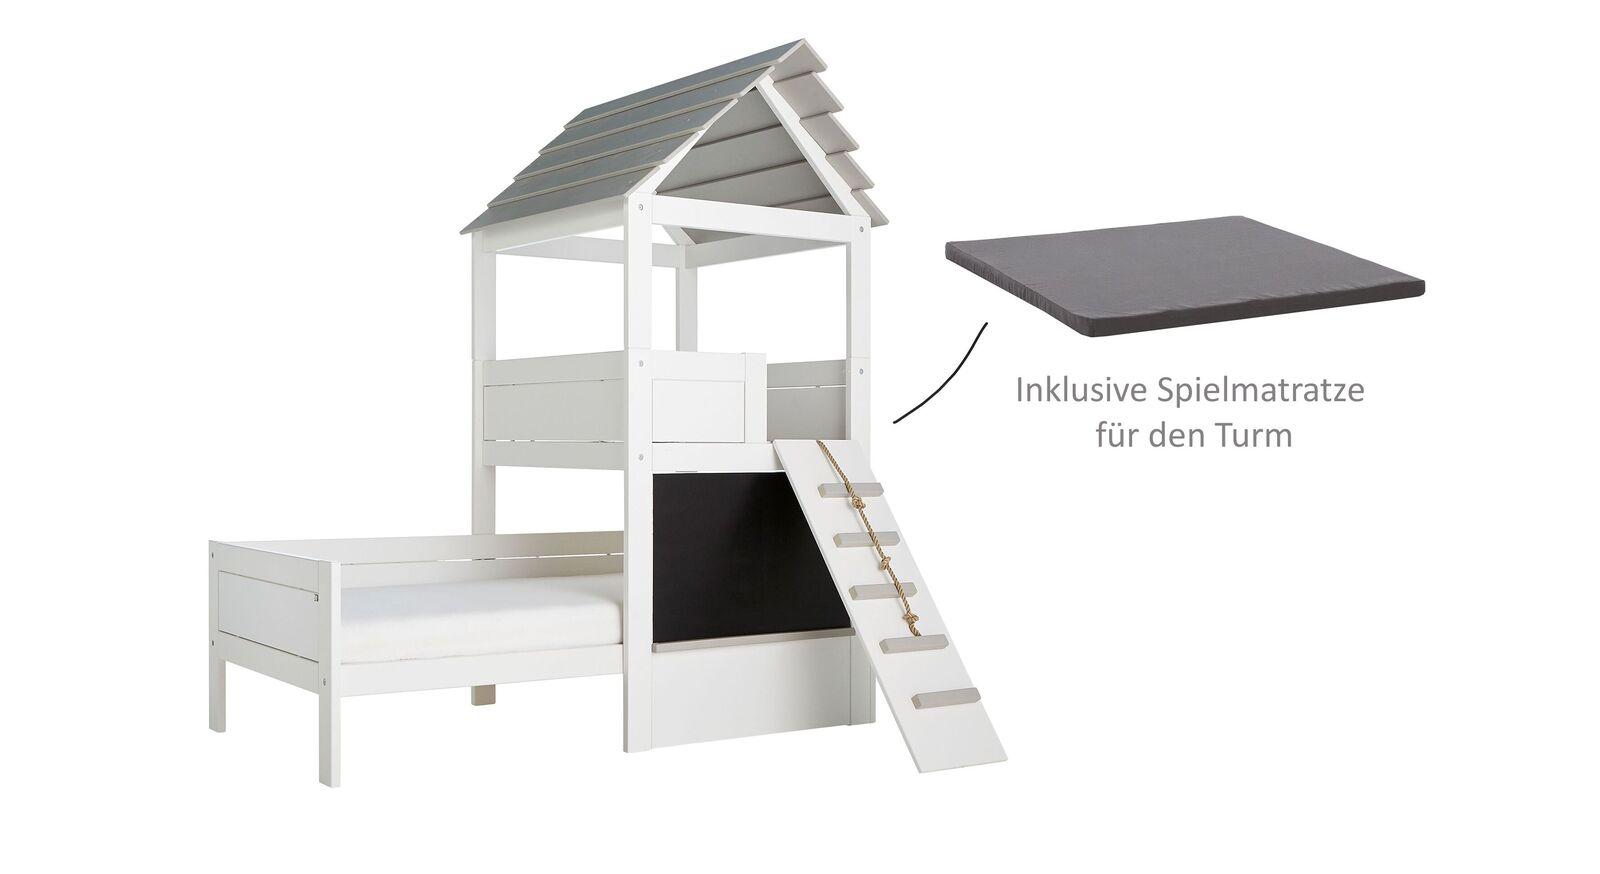 LIFETIME Kinderbett Play Tower inklusive Spielmatratze